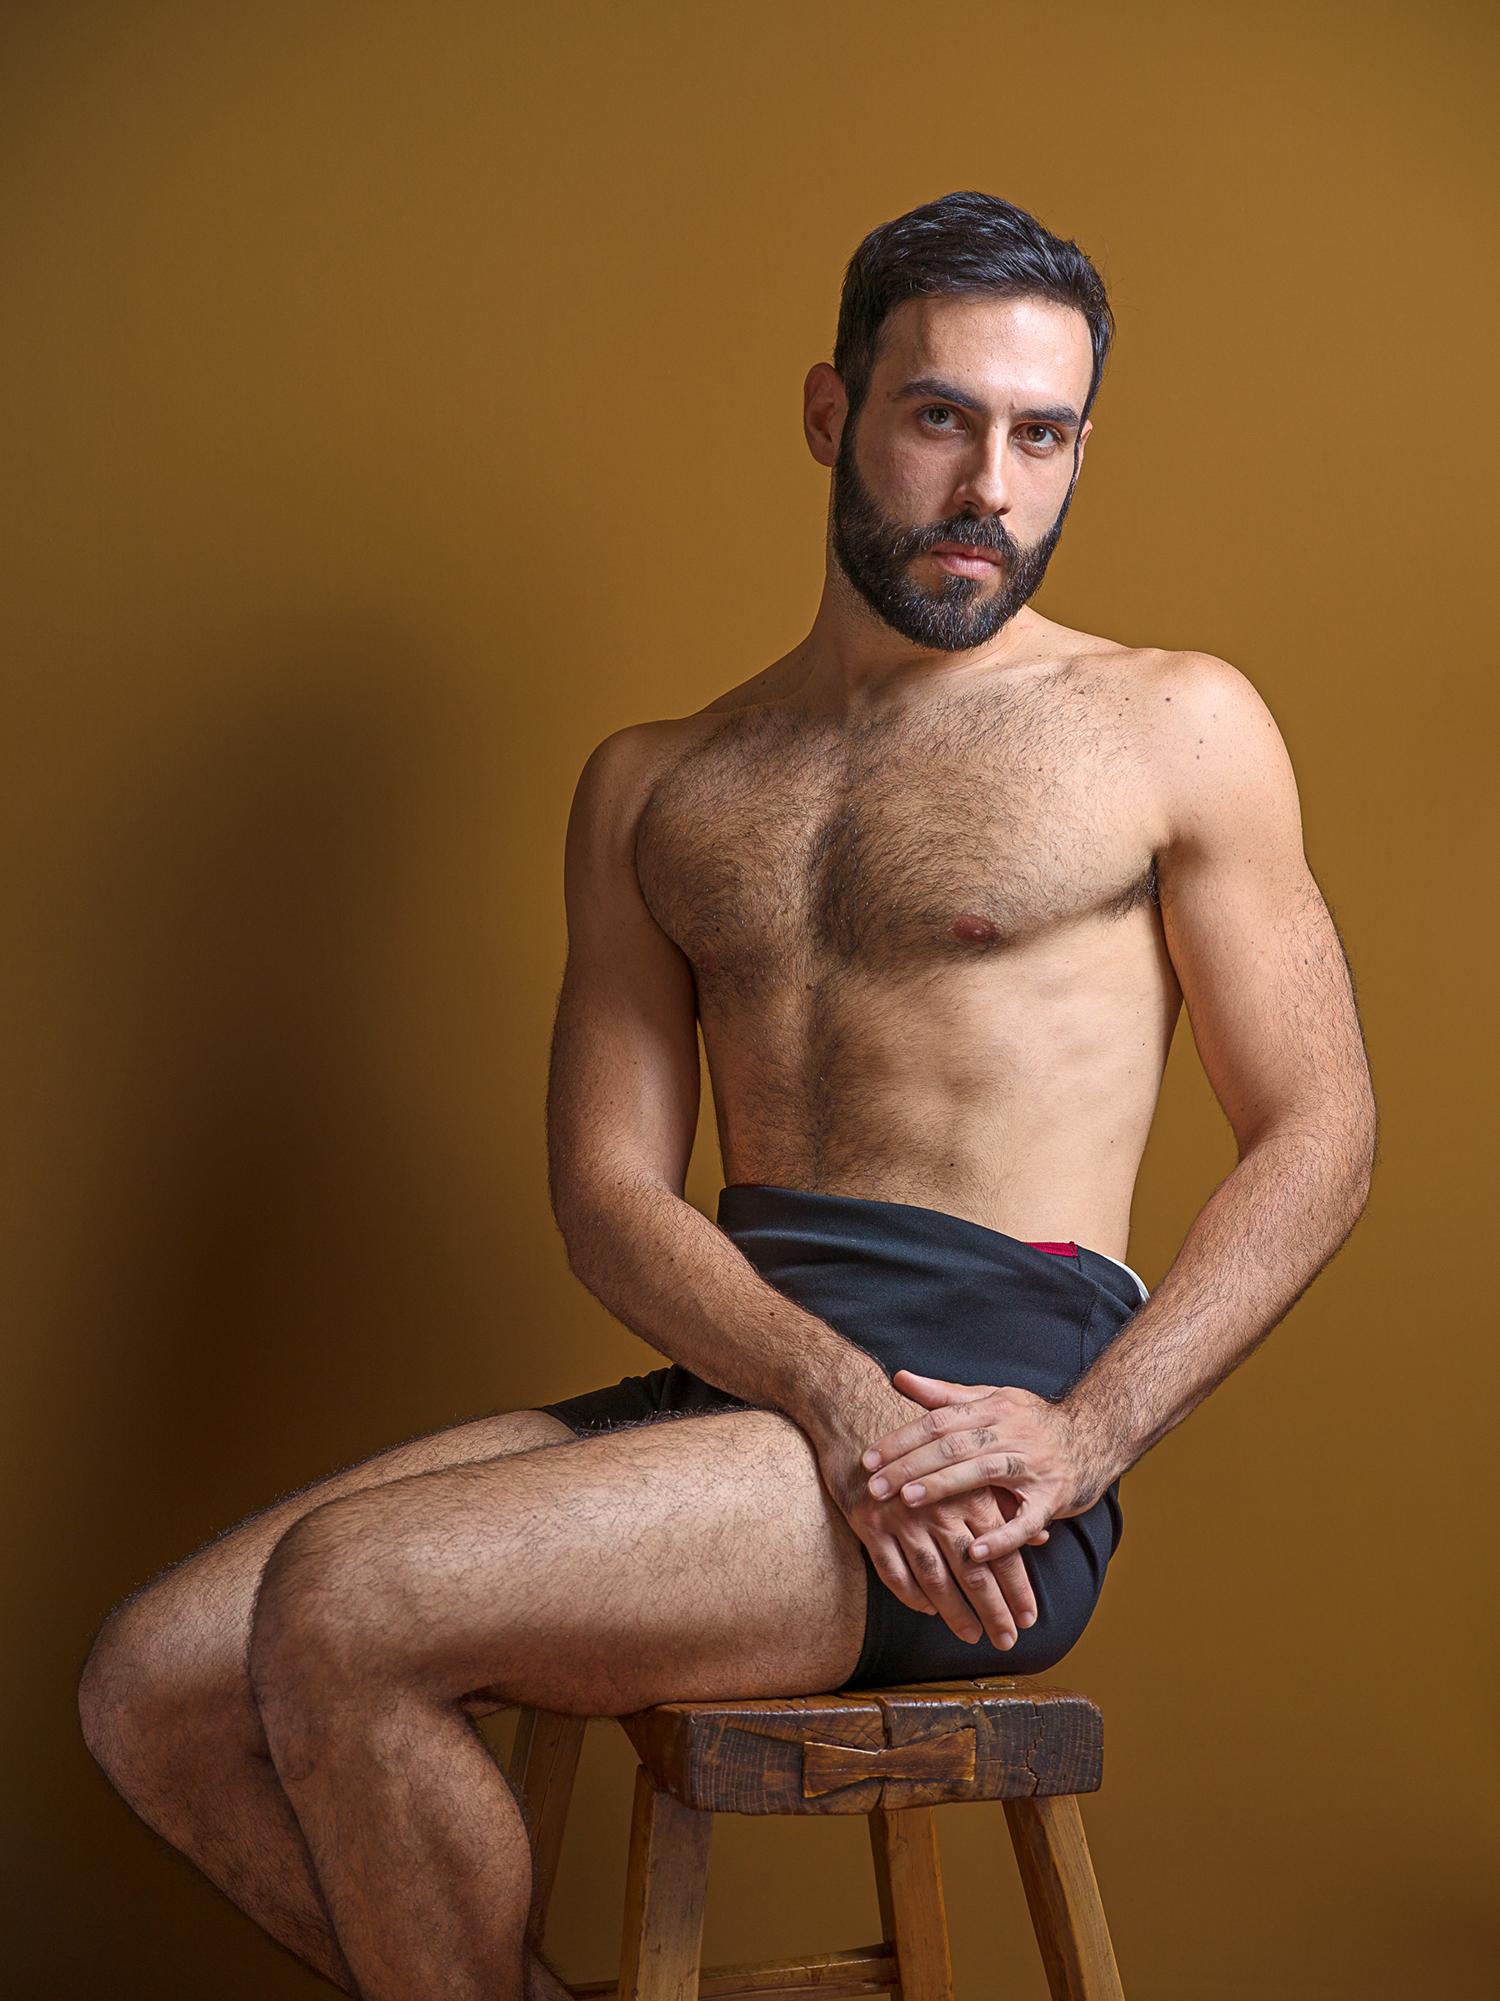 Intimate Strangers,Gabriele Sitting on Wooden Stool